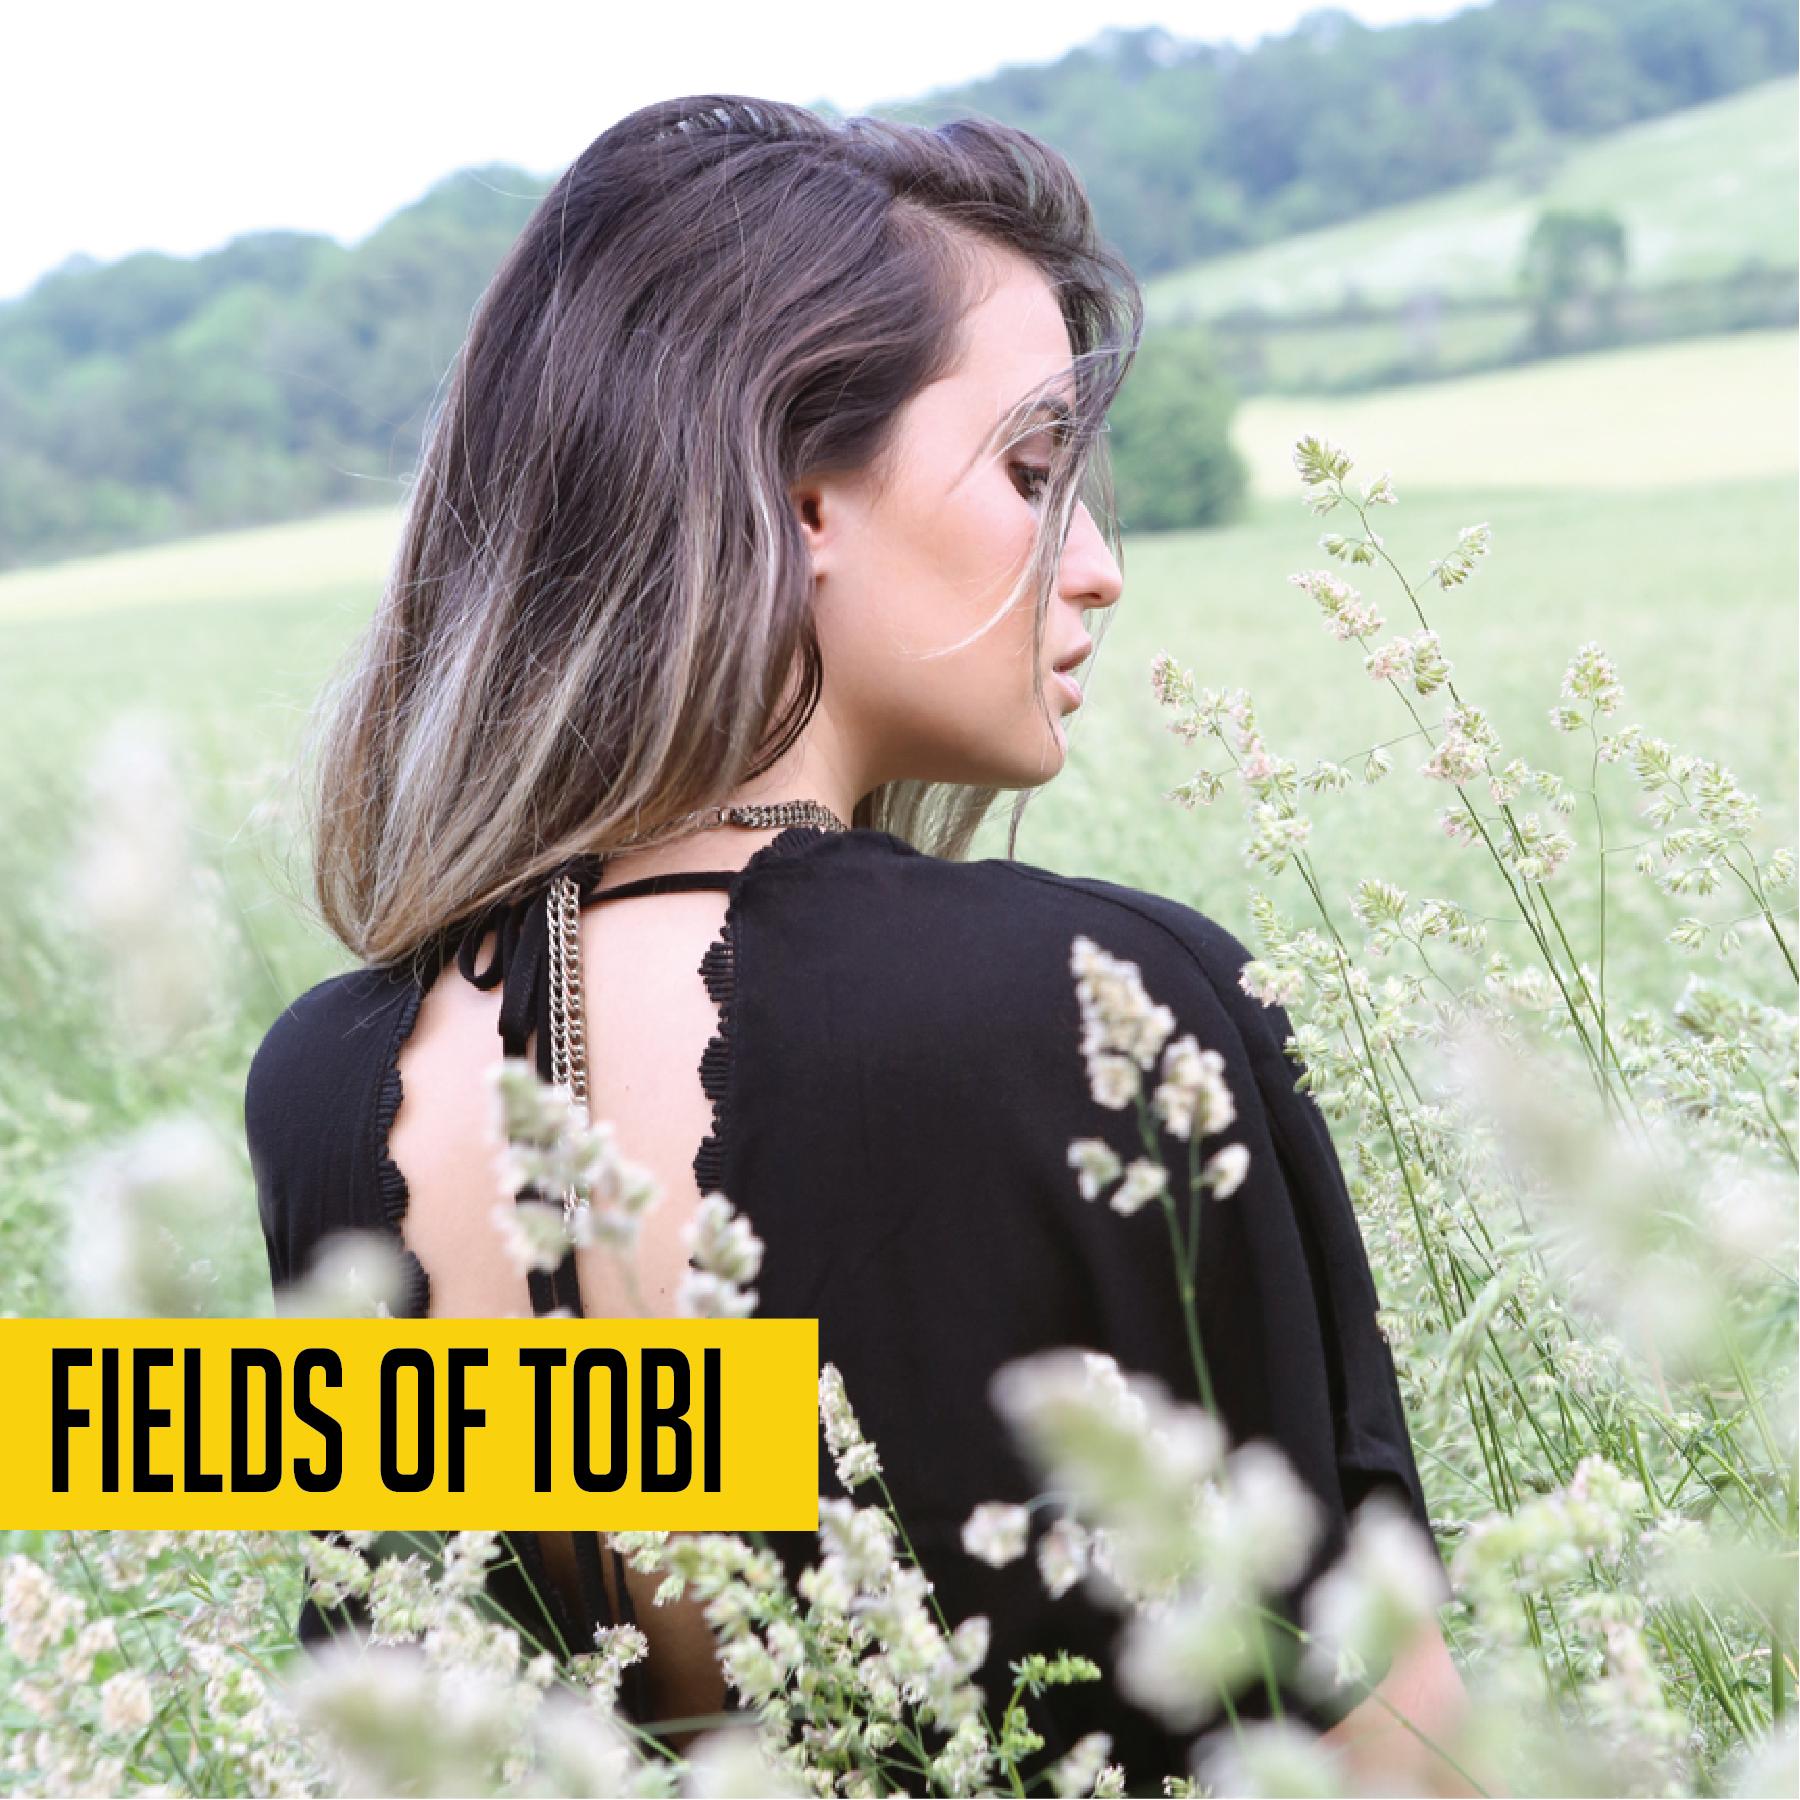 16_May_Its_Kriativ_Fashion_Black_Tobi_Dress_Nordstrom_blogger-01.jpg